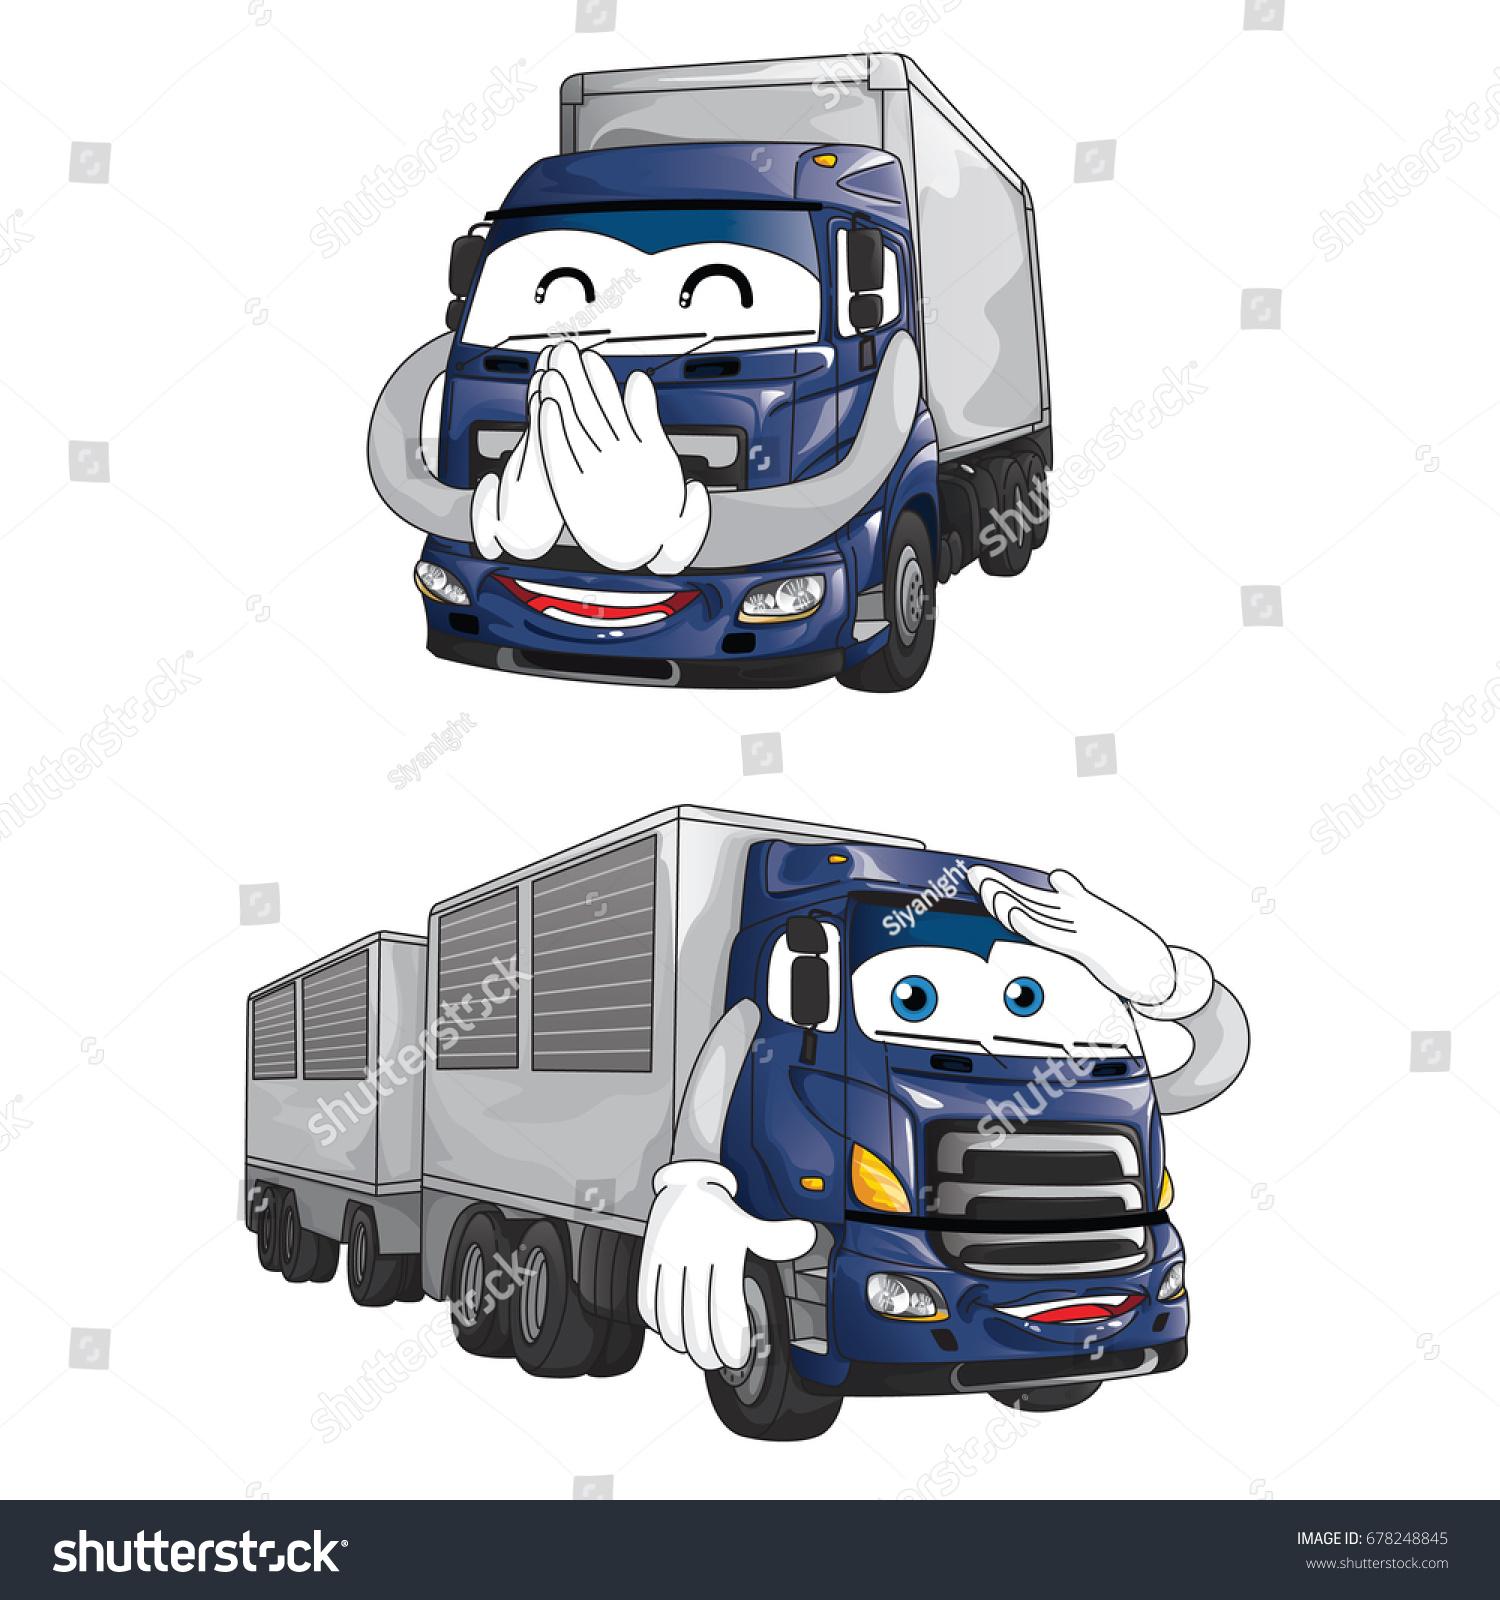 Trailer Truck Mascot Character Design Vehicle Stock Vector